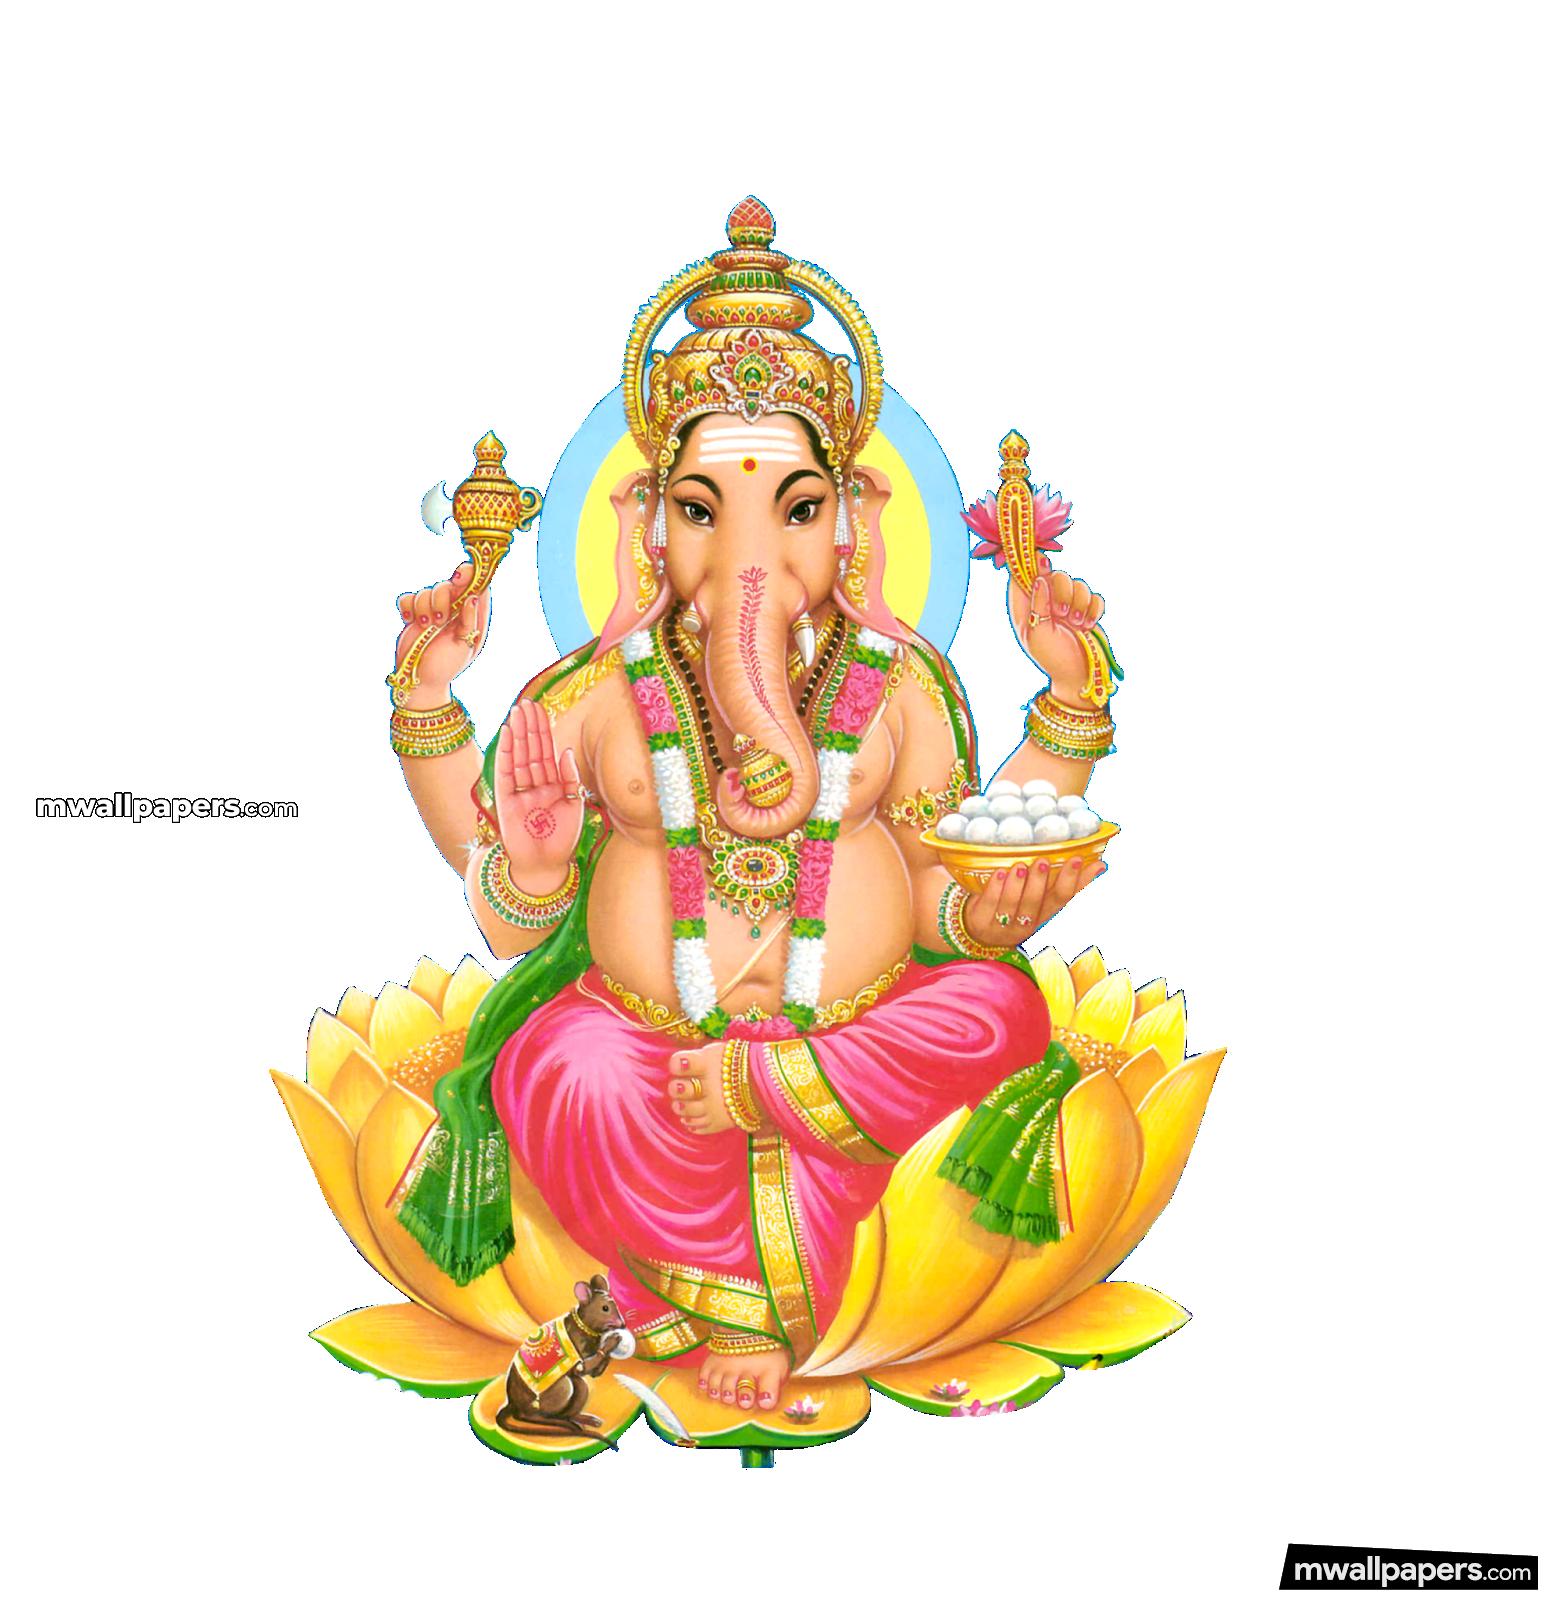 God Vinayagar Pillaiyar Ganpati Latest Hd Photos Wallpapers 1080p 1412 Pi Ganesh Chaturthi Images Happy Ganesh Chaturthi Images Happy Ganesh Chaturthi